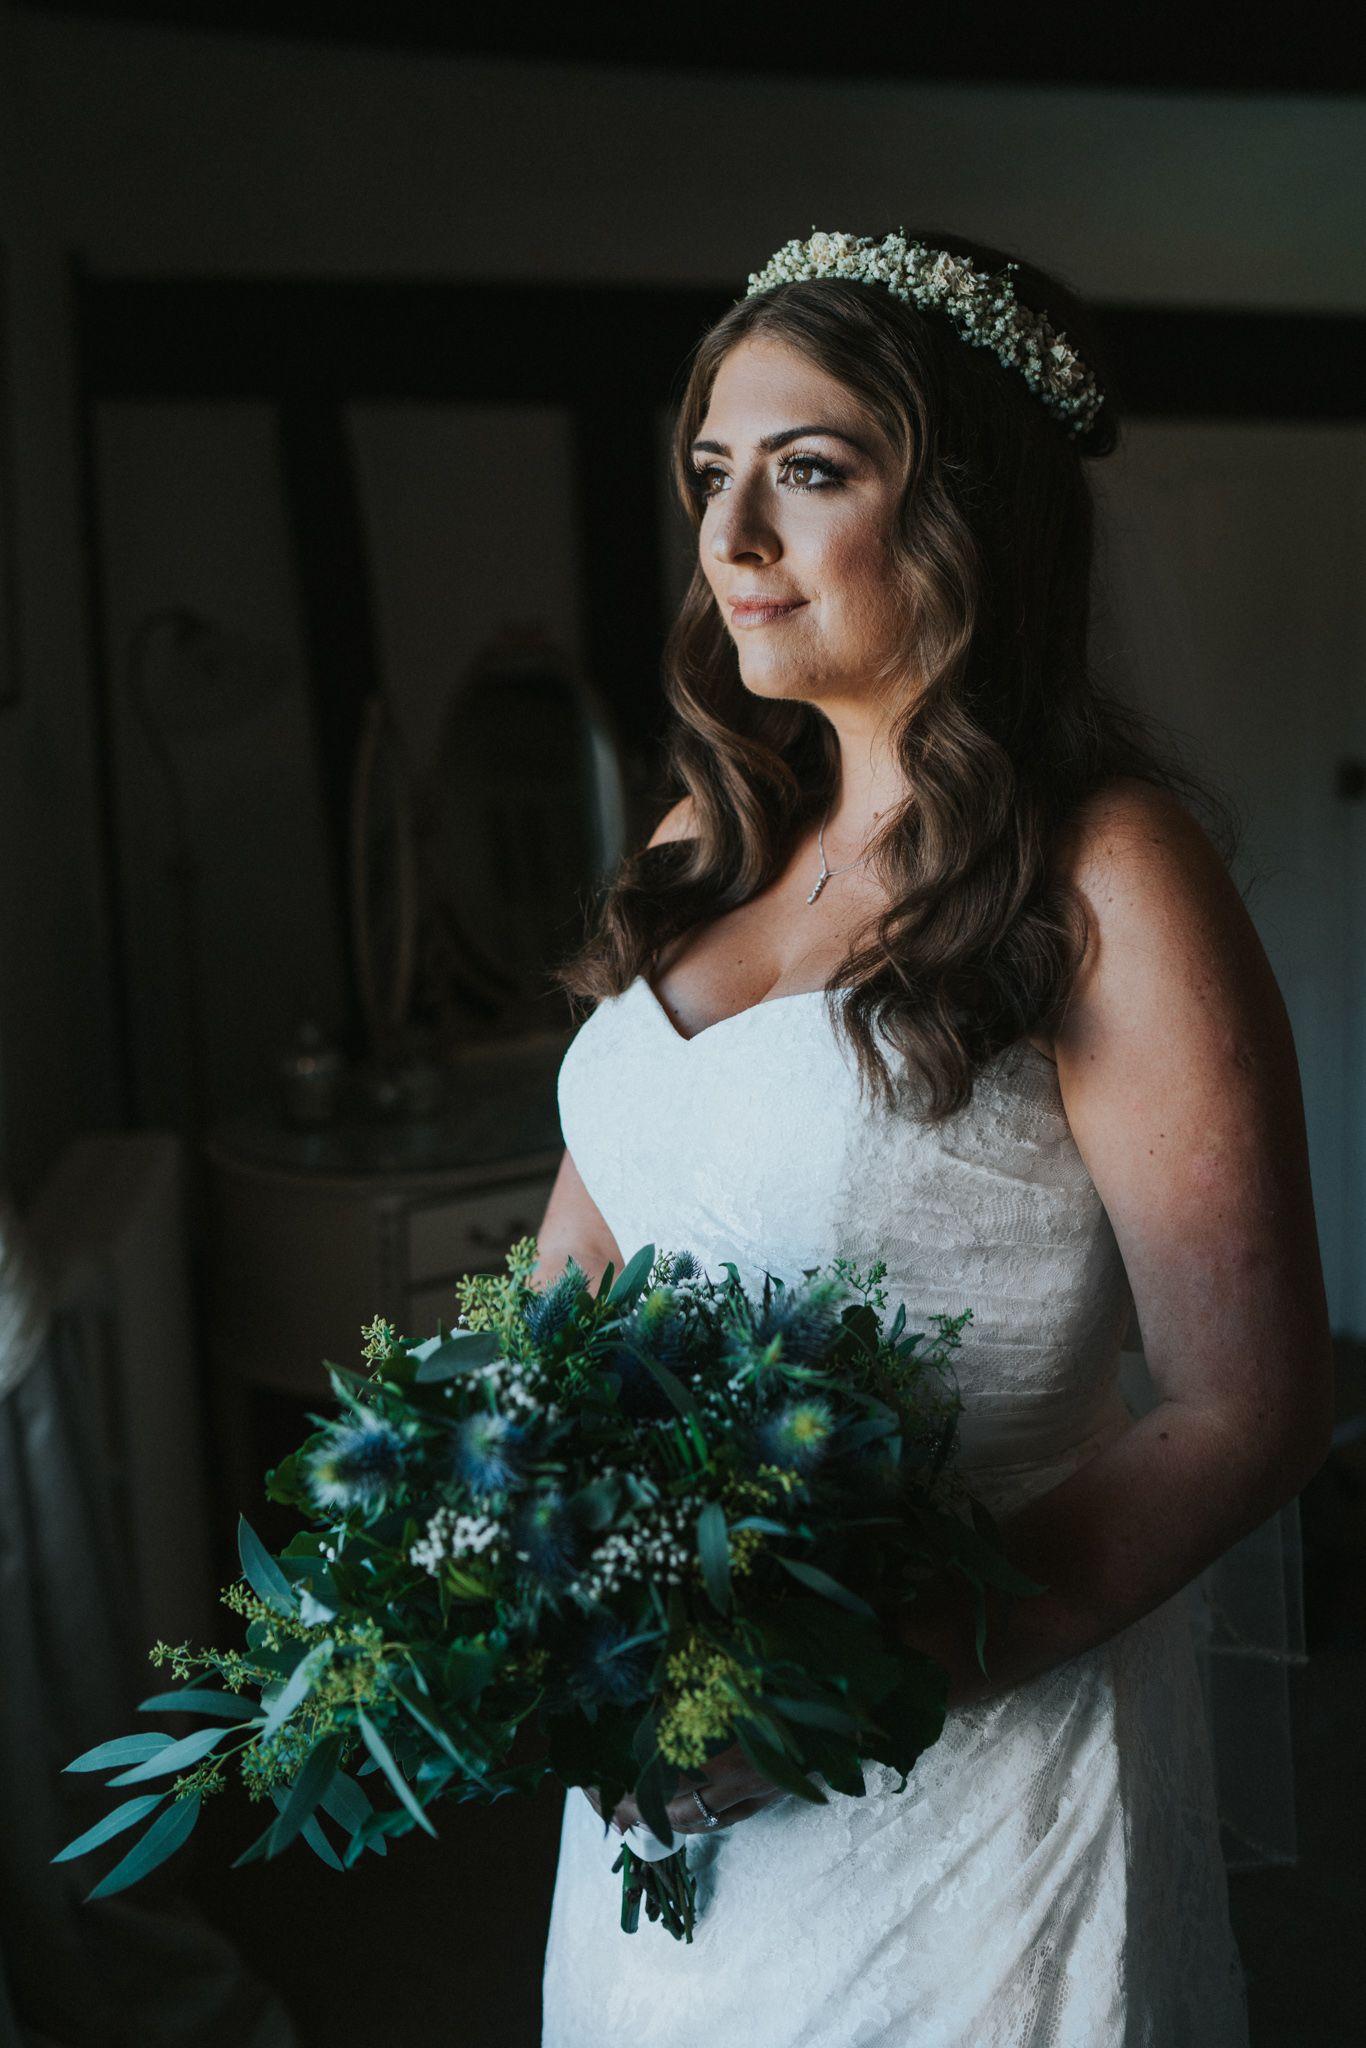 Beautifully romantic wedding on a diy budget stunning natural light